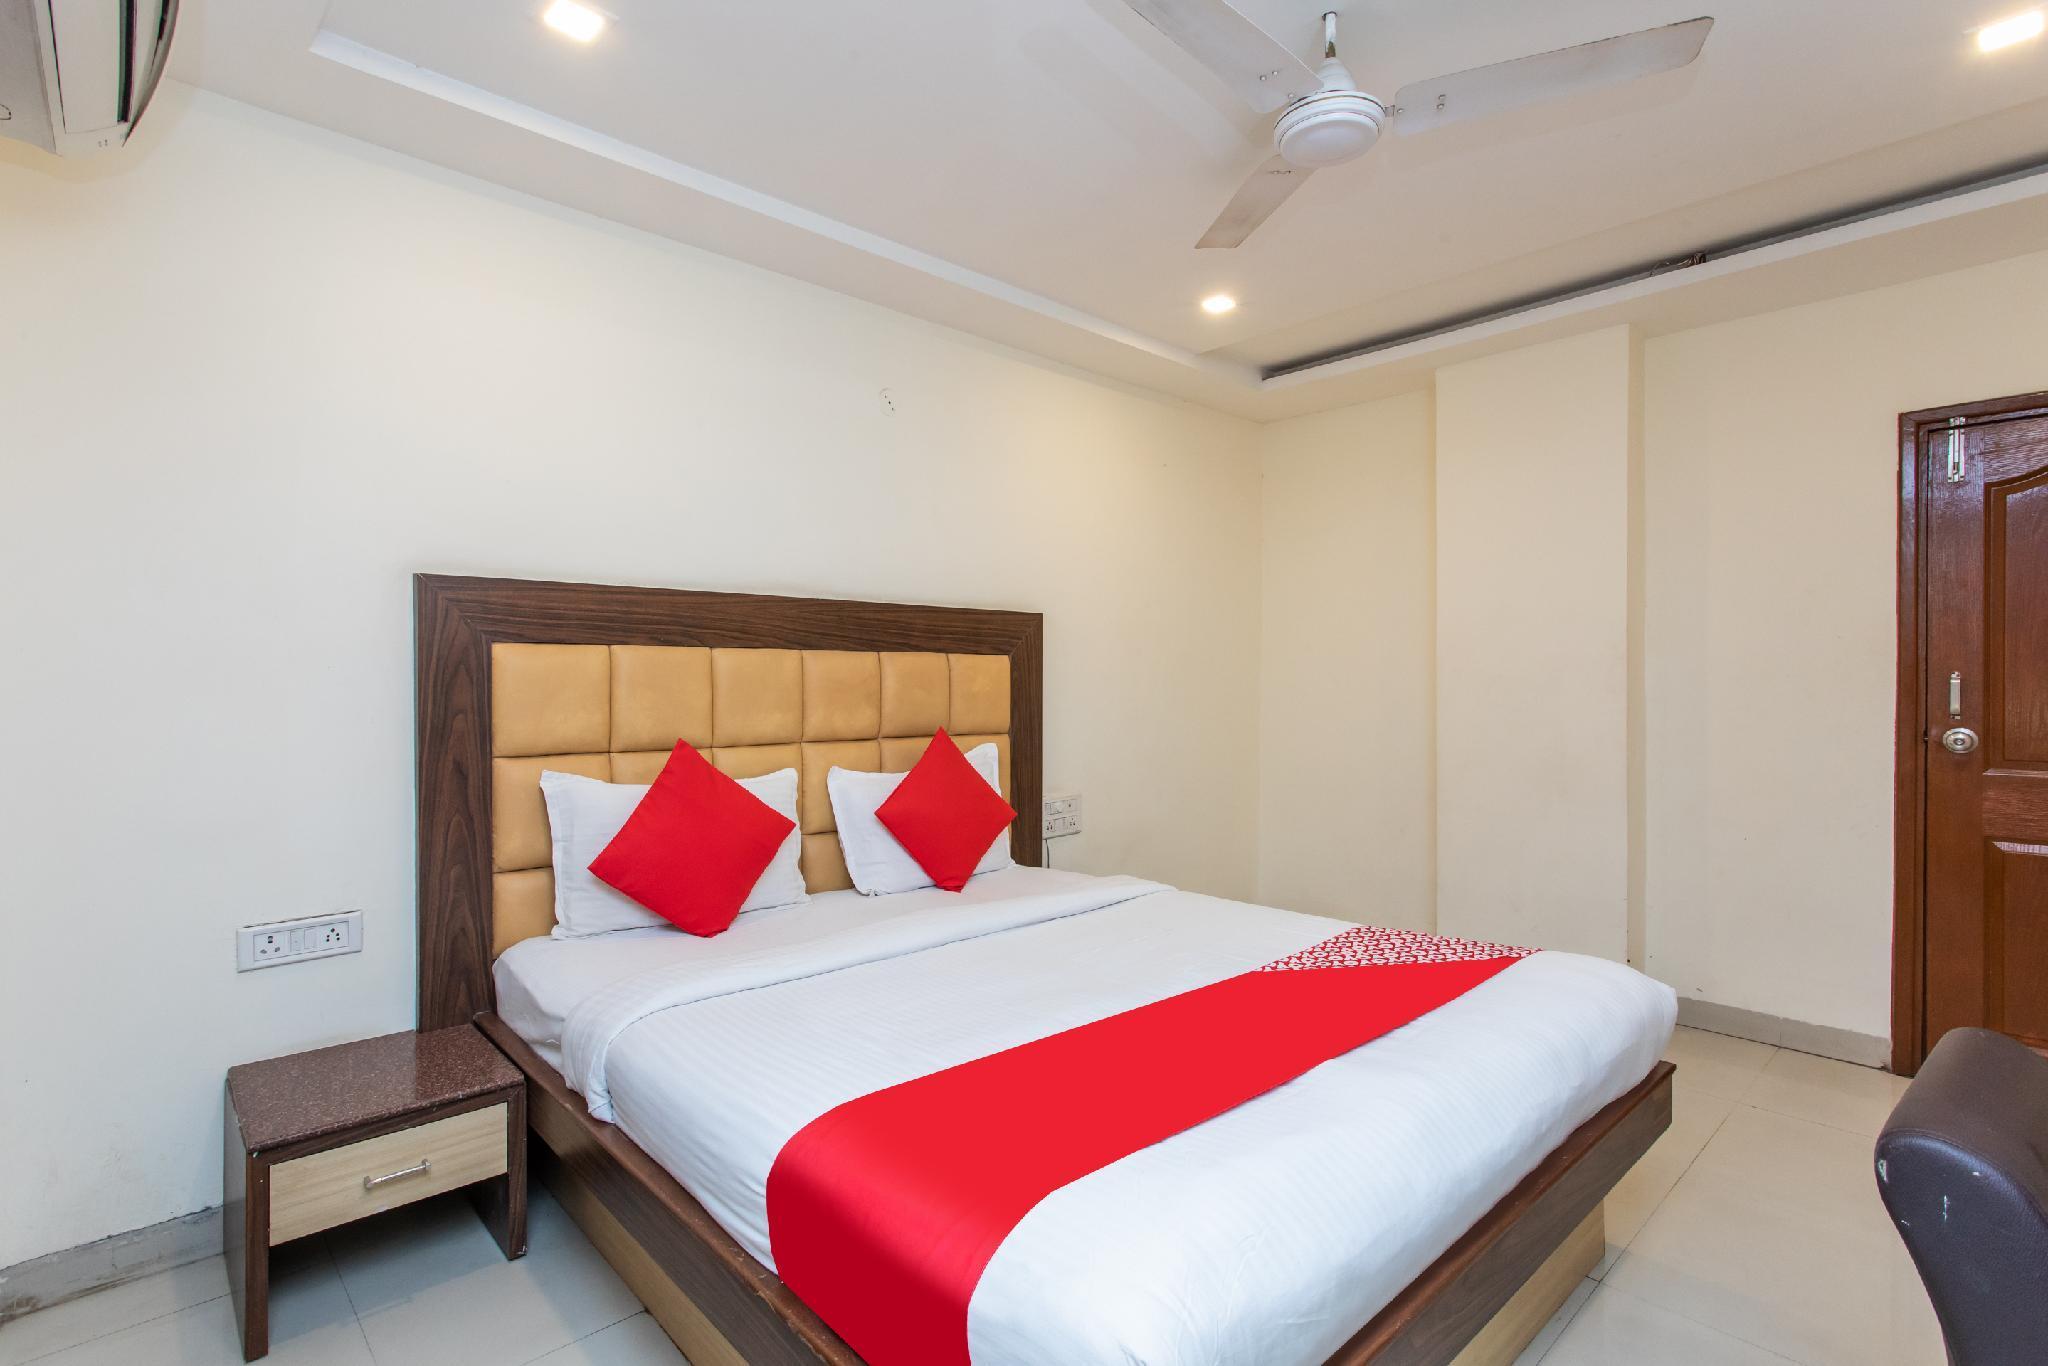 OYO Townhouse 345 Vijay Nagar